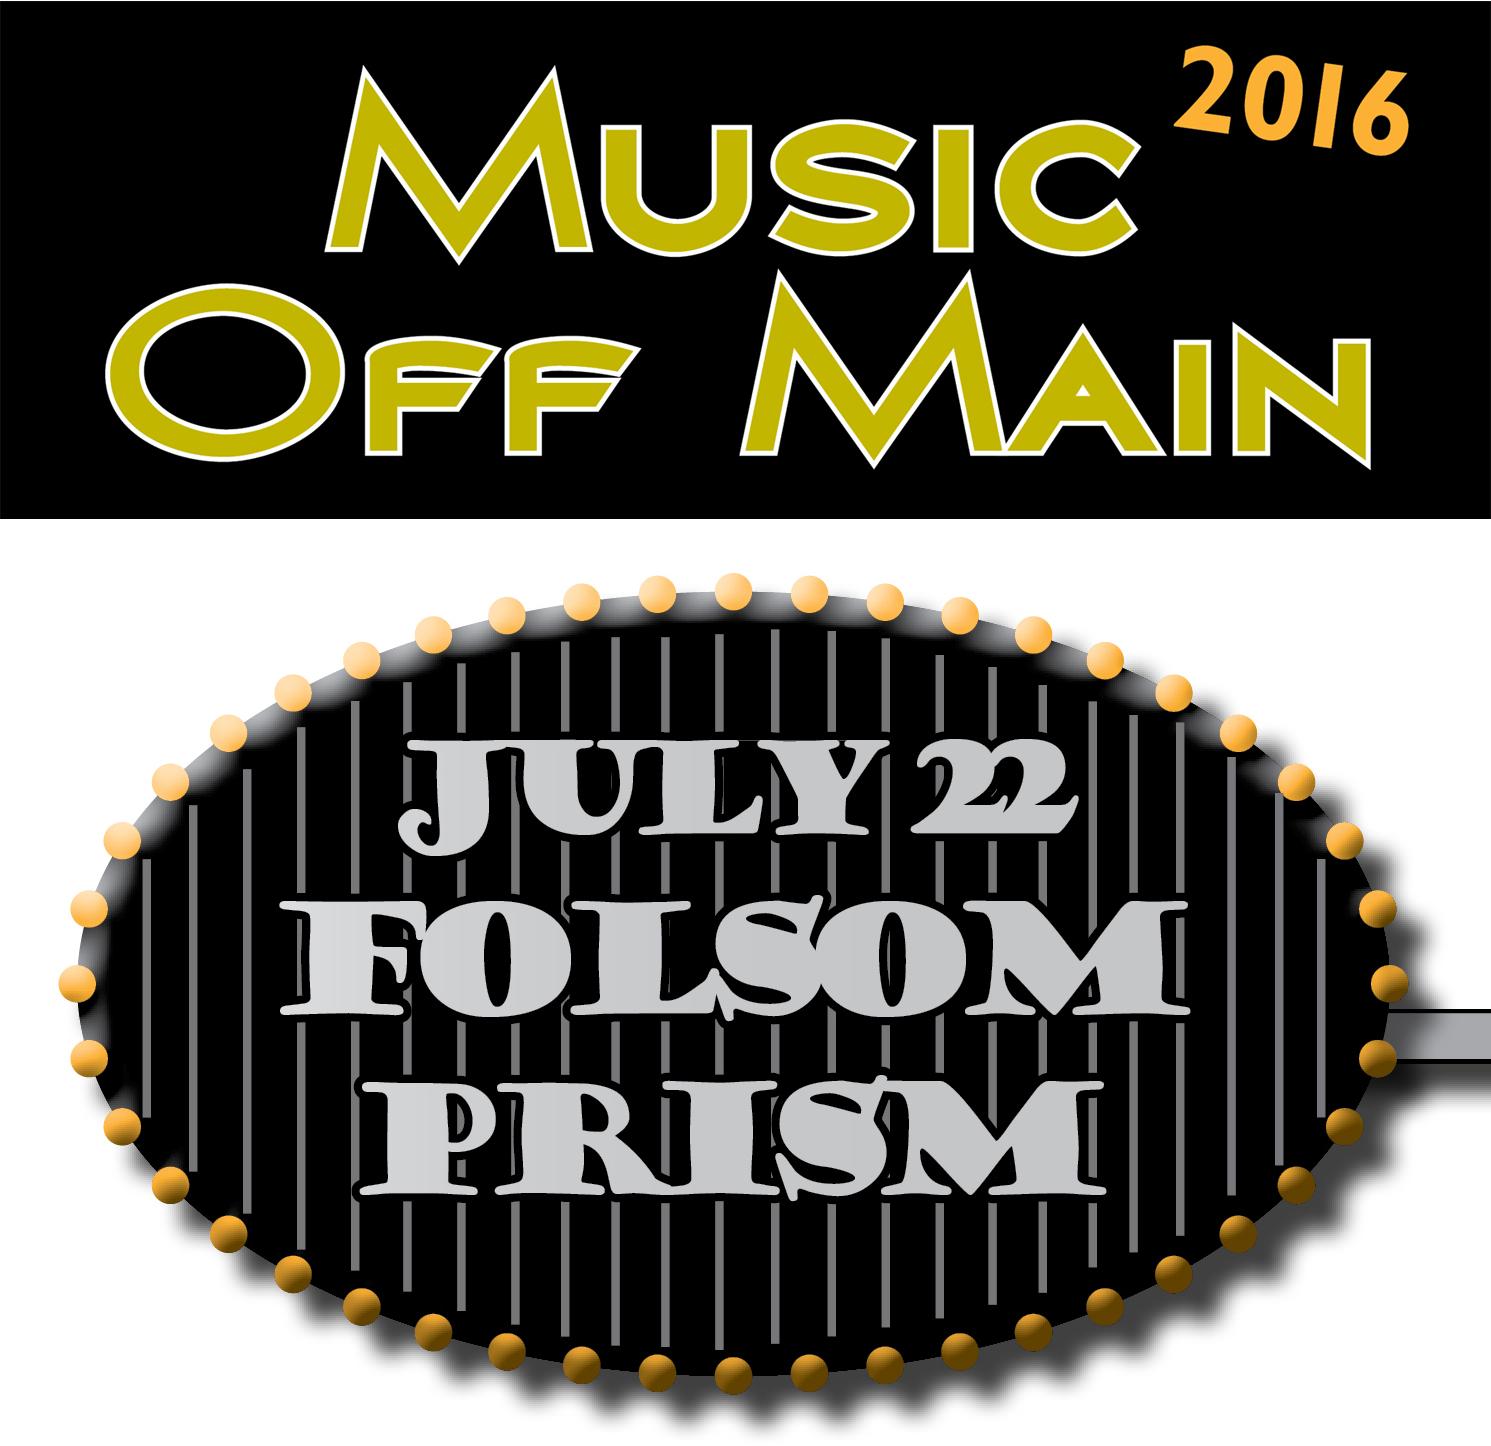 2016 MOM Folsom Prism